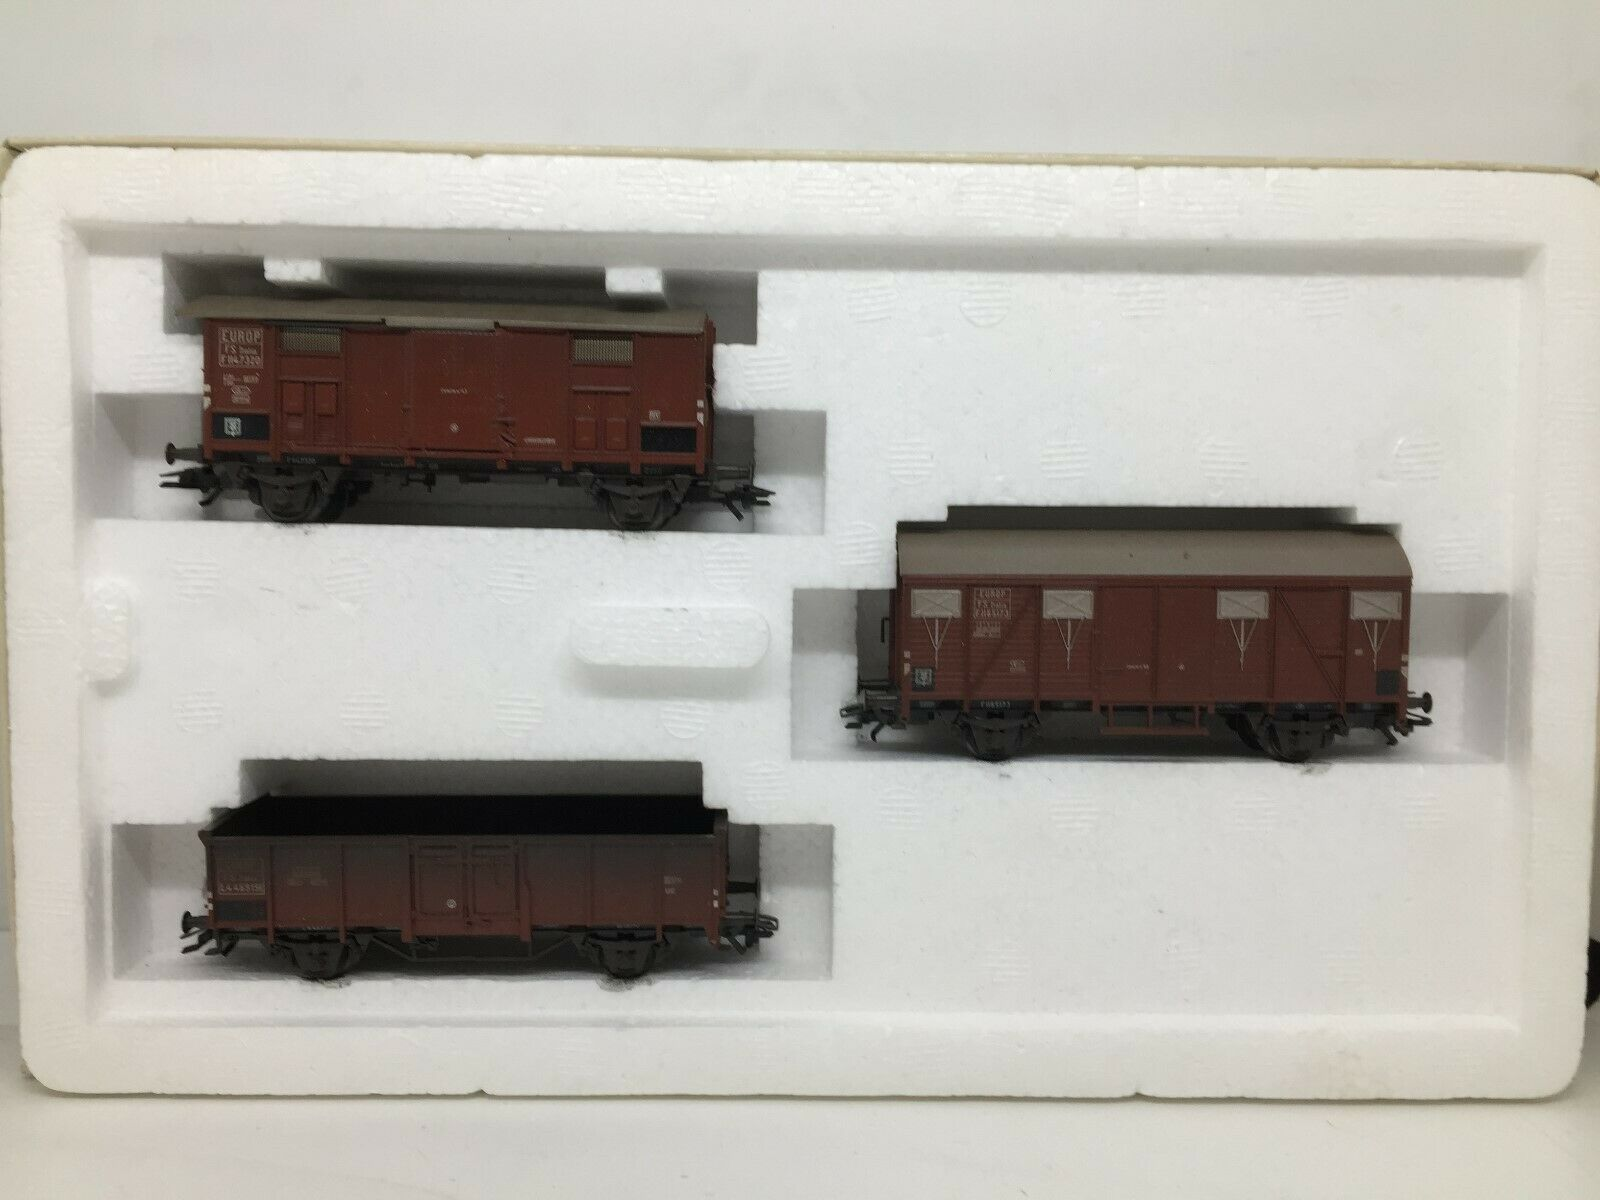 MARKLIN HO coffret de 3 anciens wagons marcheises réf. 47889